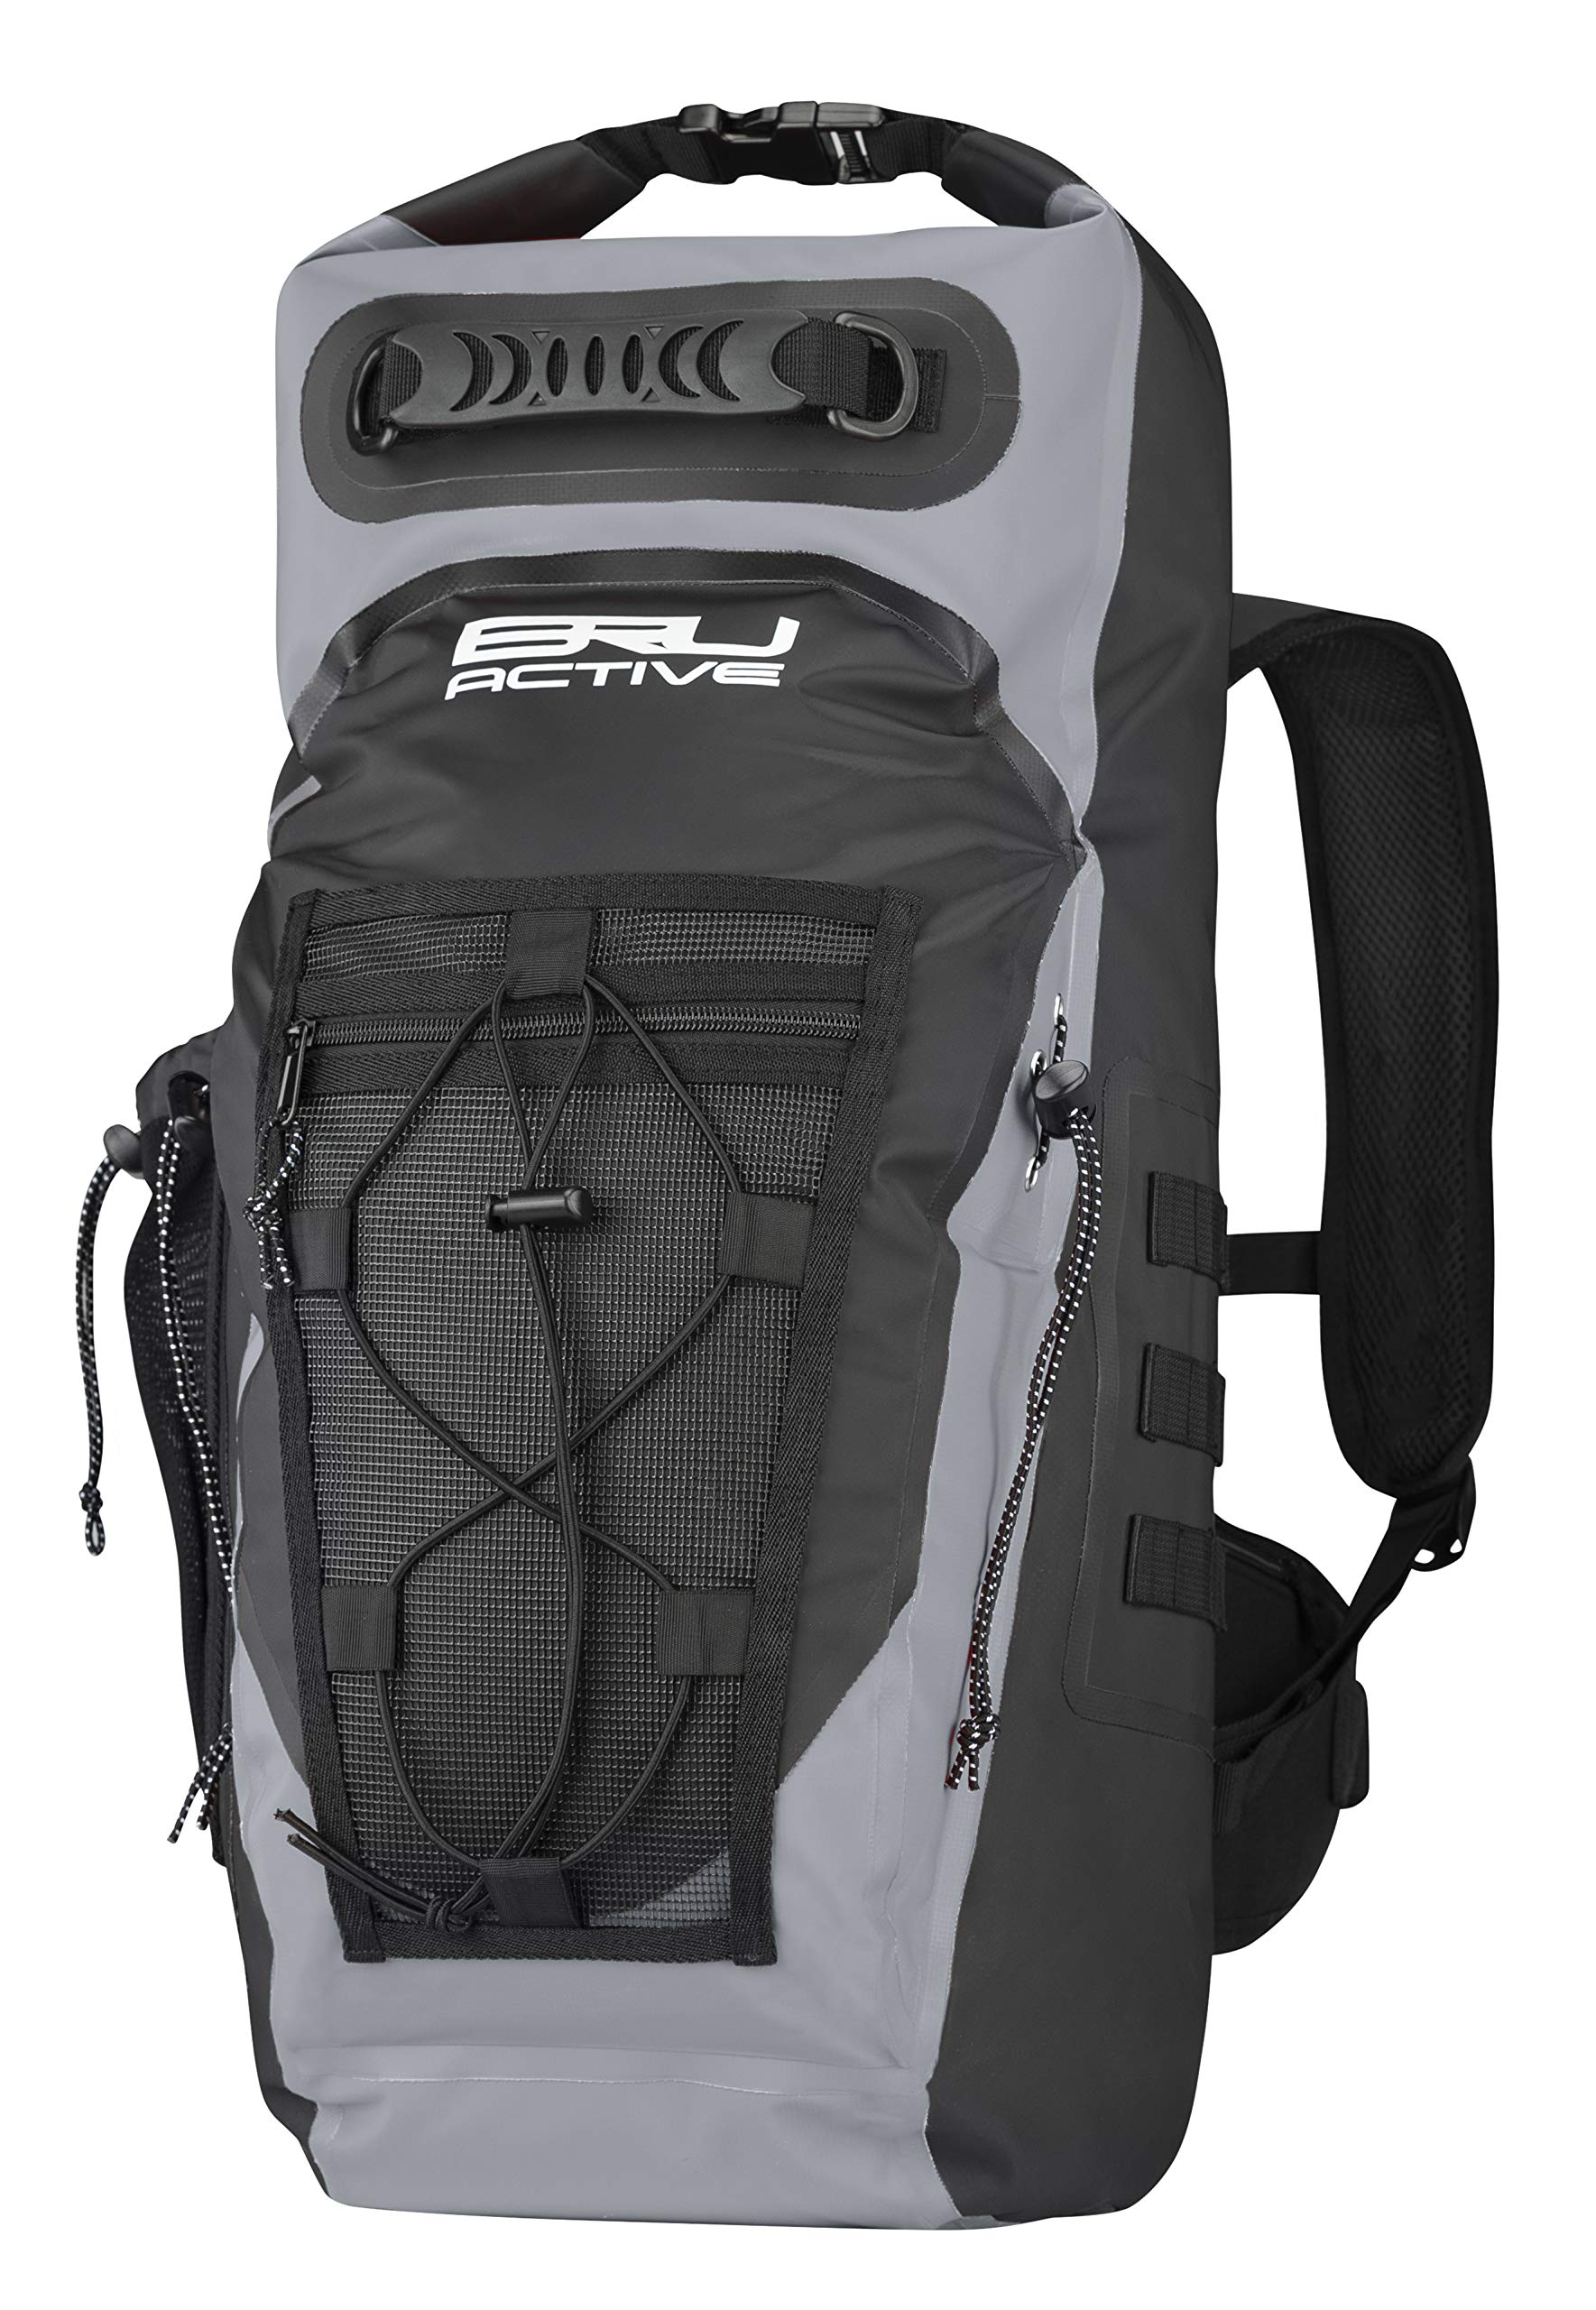 BRU Active Premium Dry Backpack Waterproof - 35L Waterproof Backpack - Sizes Zippers, Drawstring, Heavy Duty Adjustable Straps Kayaking, Boating, Hiking, Water Sports, Fishing (Gray, 35L) by BRU Active